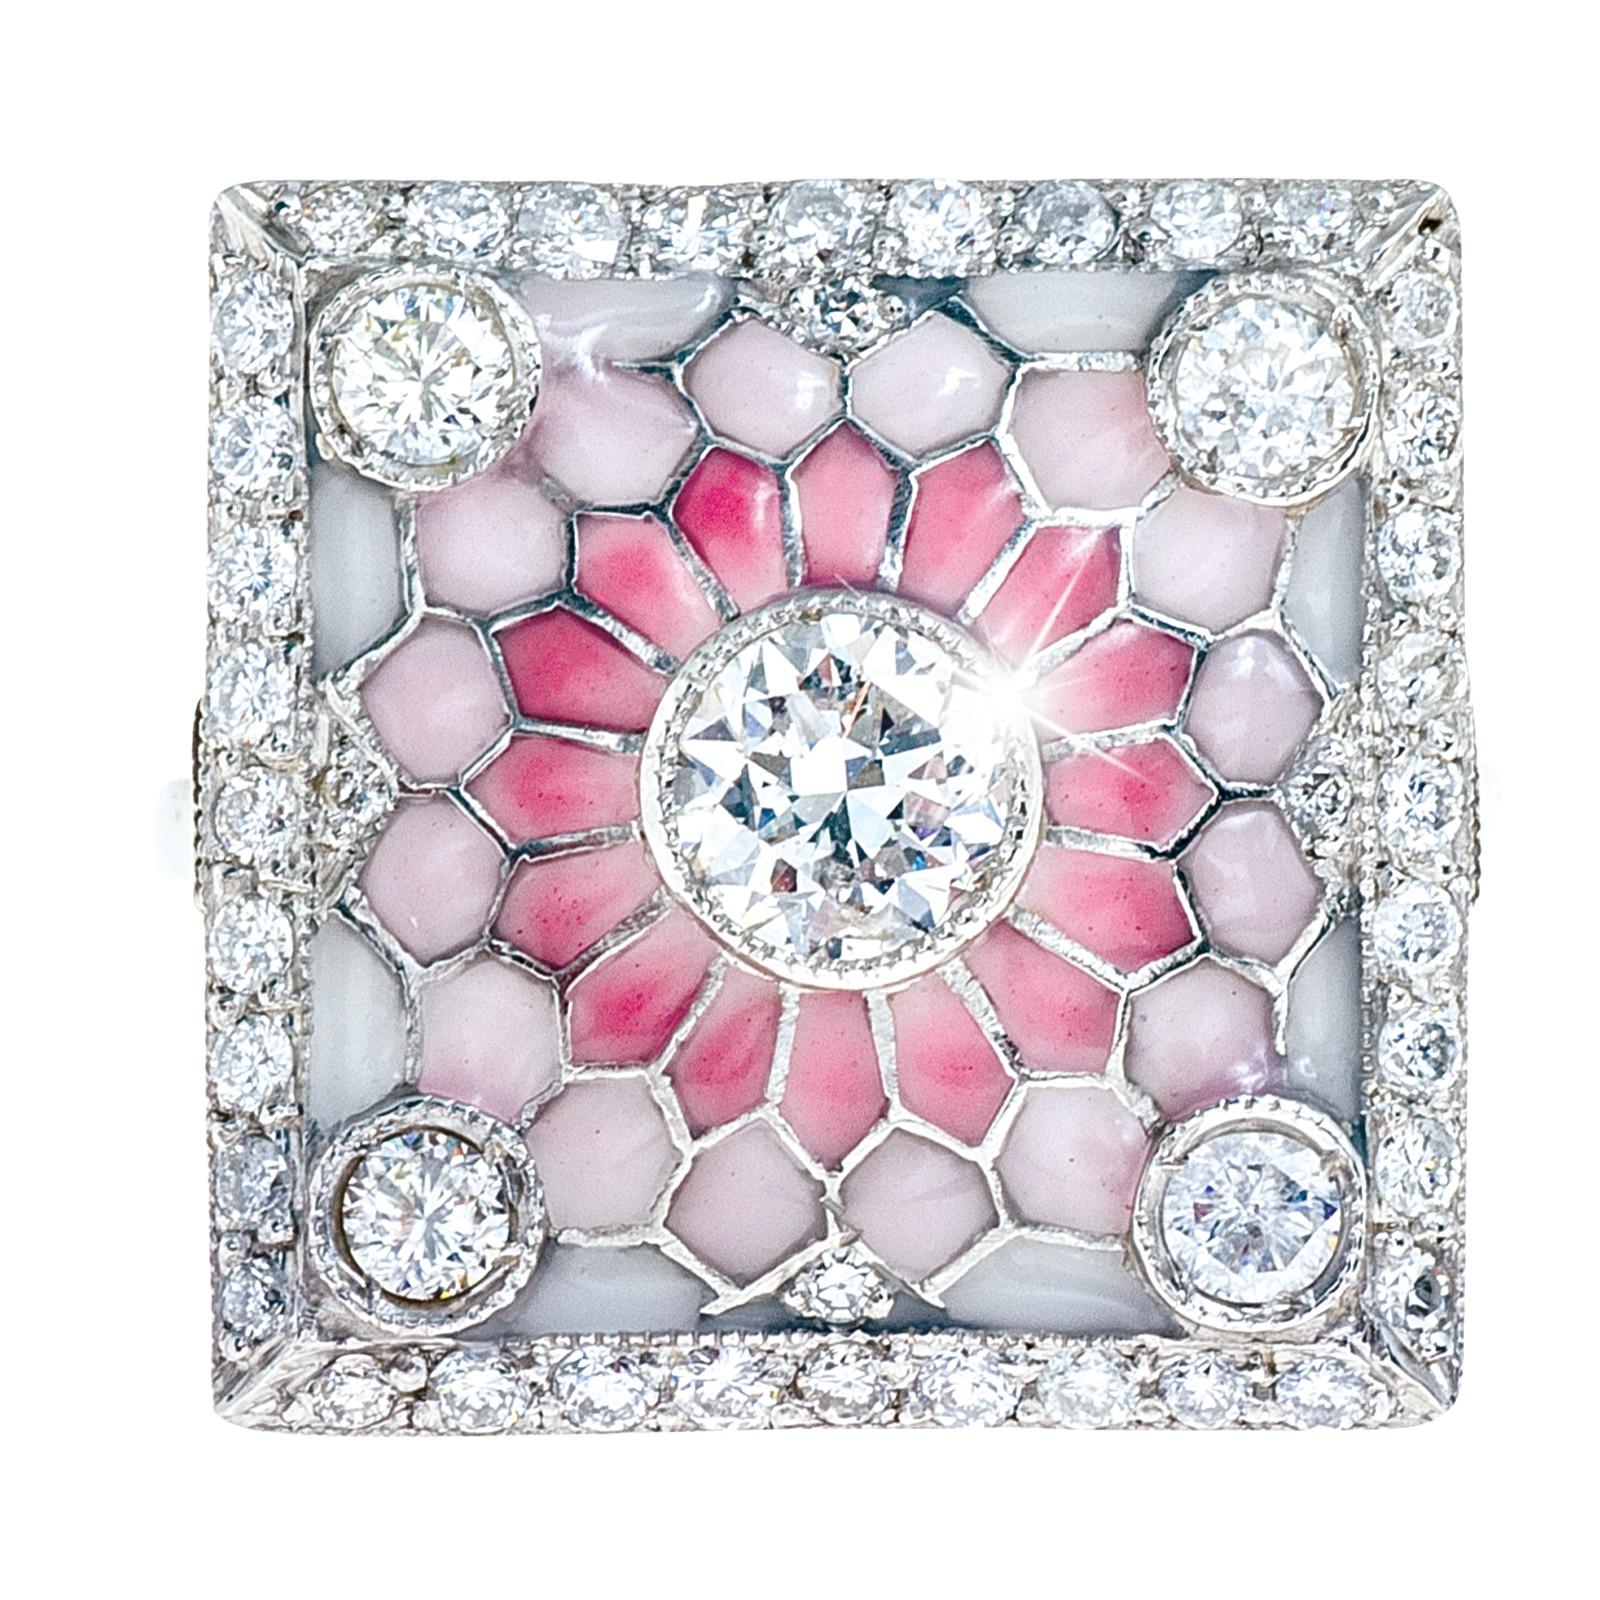 New Art-Deco-Inspired Honeycomb 1.36 CTW Diamond Ring